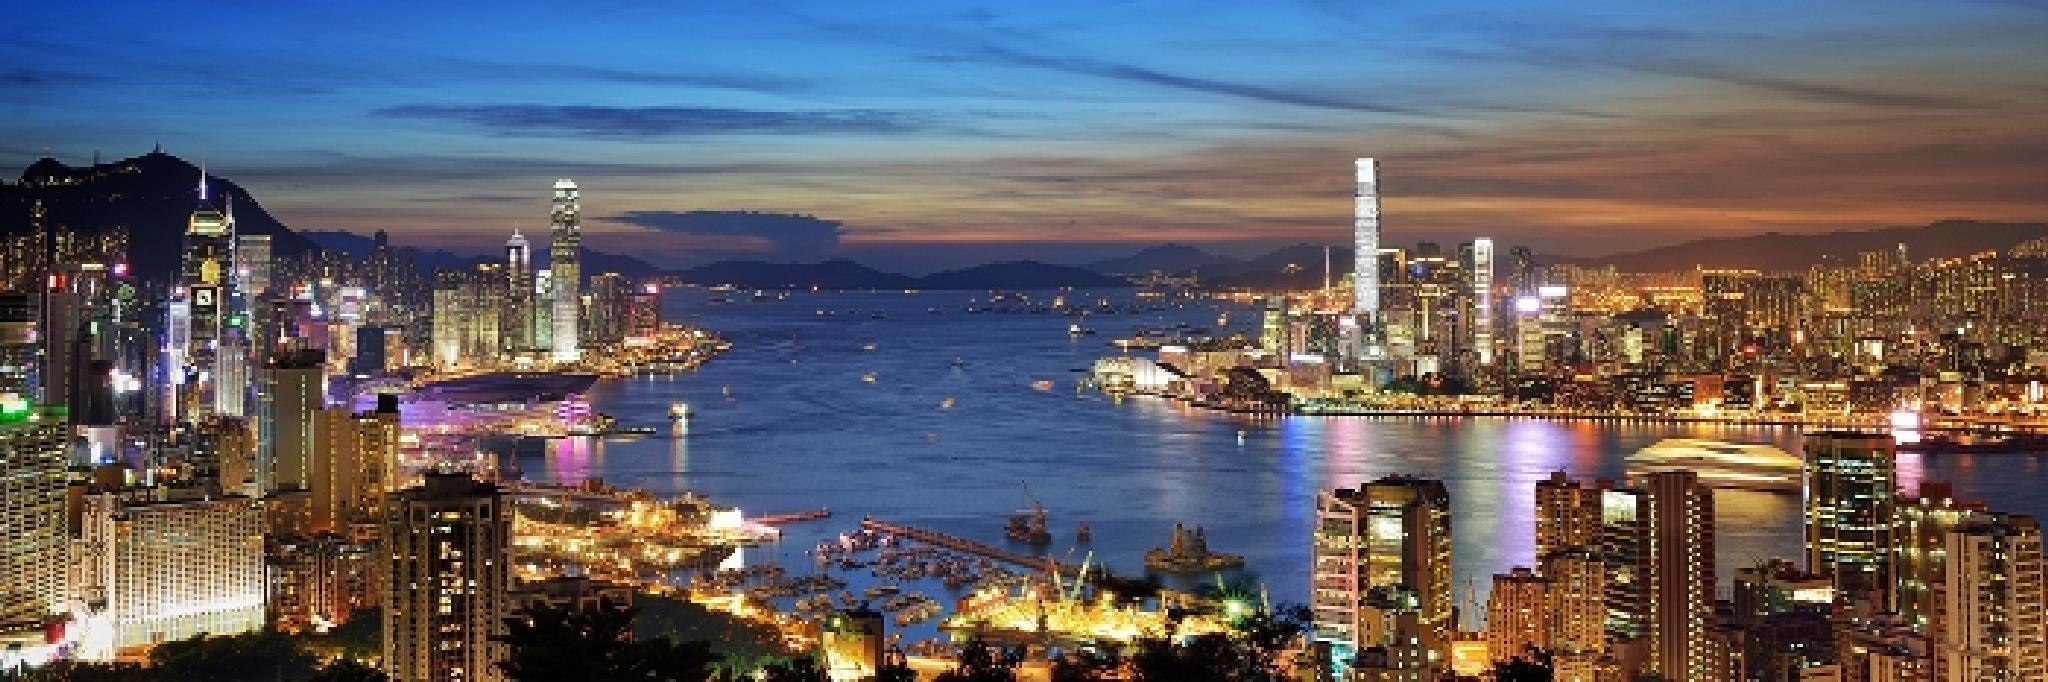 Hong Kong night scene by colonelnikon